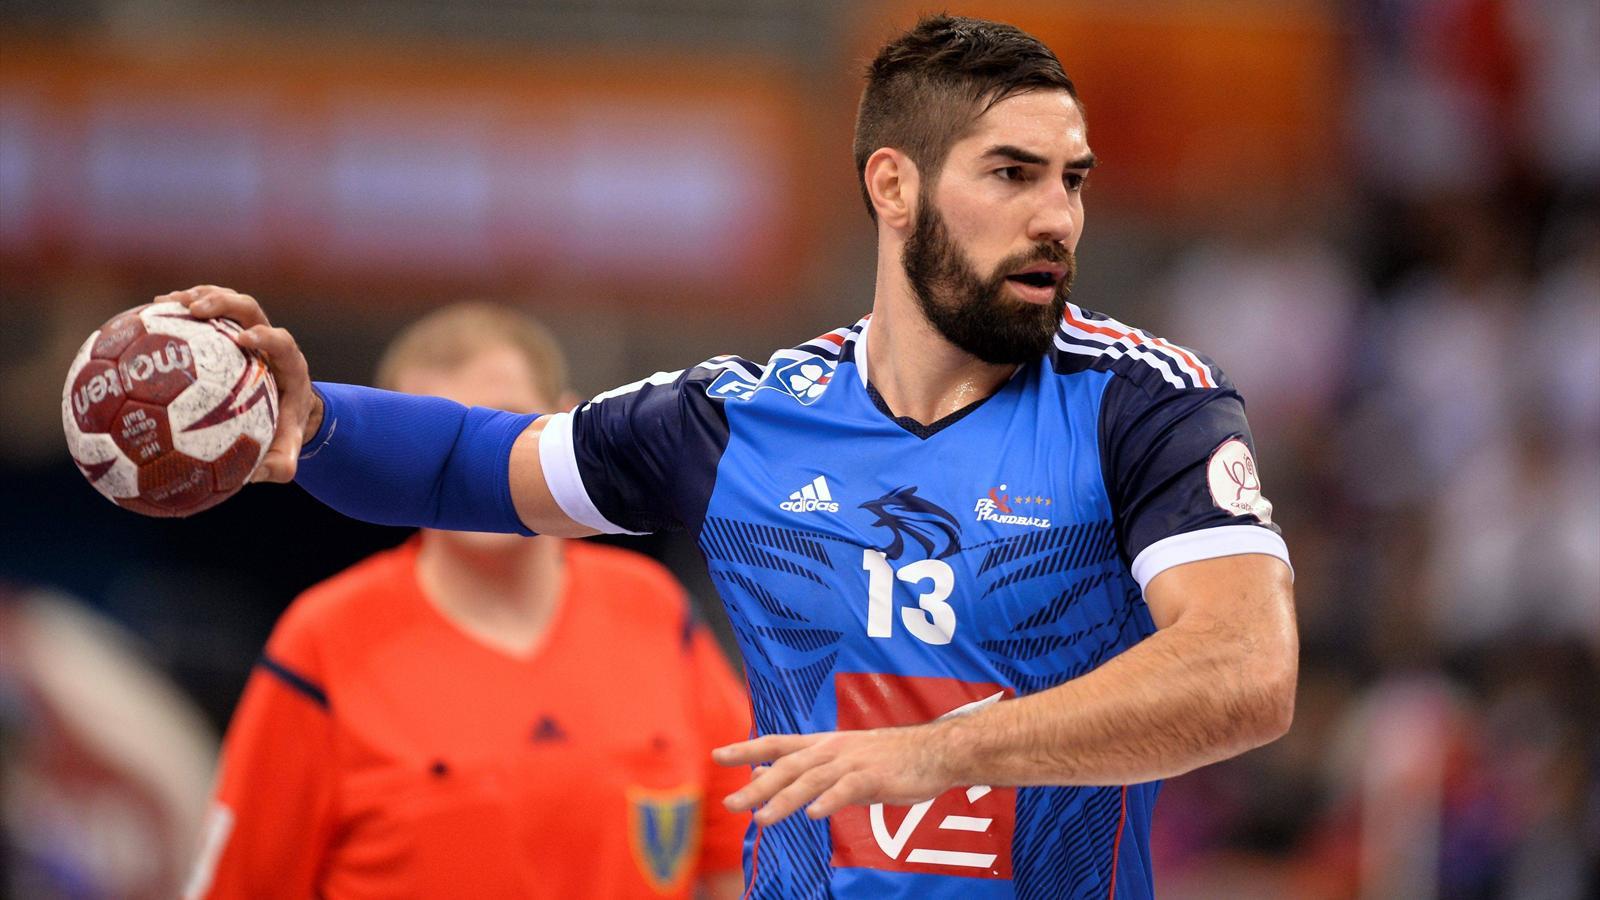 Hand nikola karabatic indisponible plusieurs semaines - Calendrier coupe du monde de handball 2015 ...